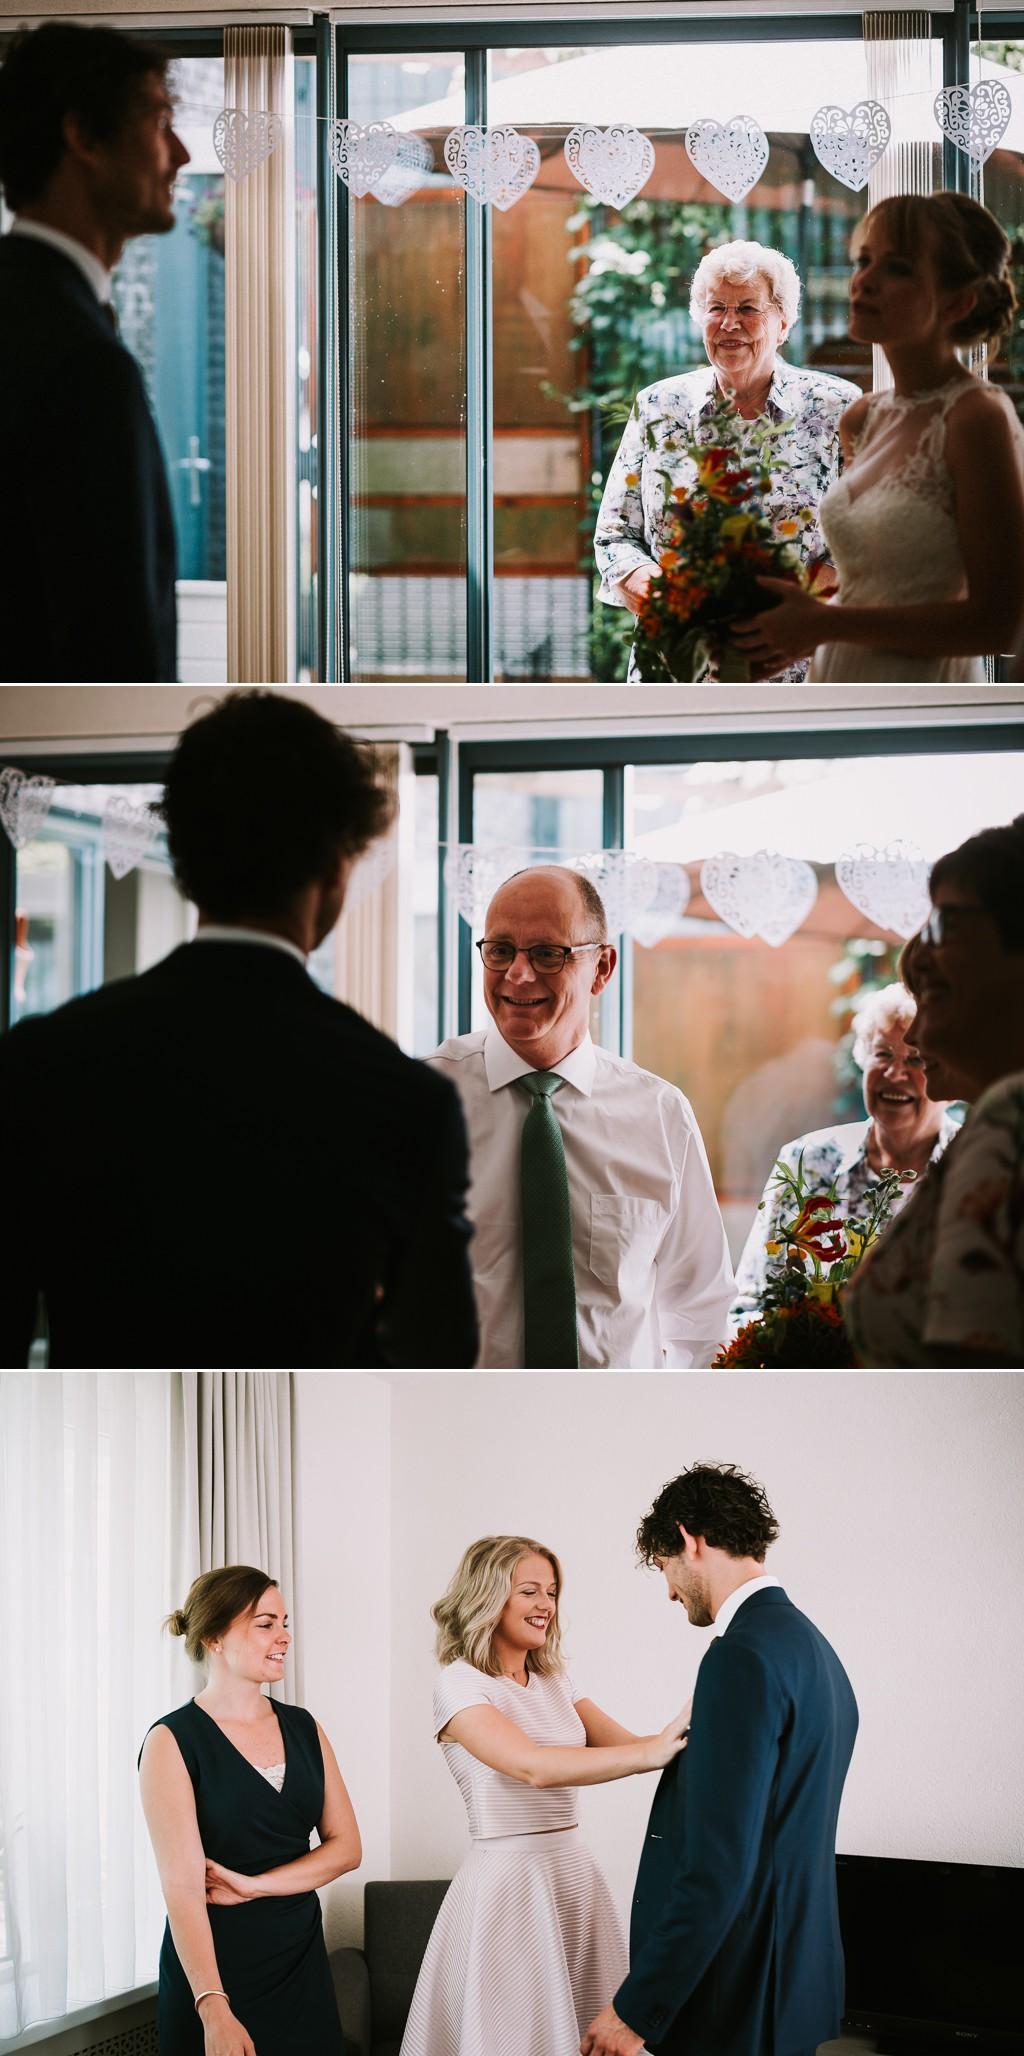 trouwfotograaf-rotterdam-trouwen-in-het-bos-arnhem-fotografie-steef-utama-w-w-02